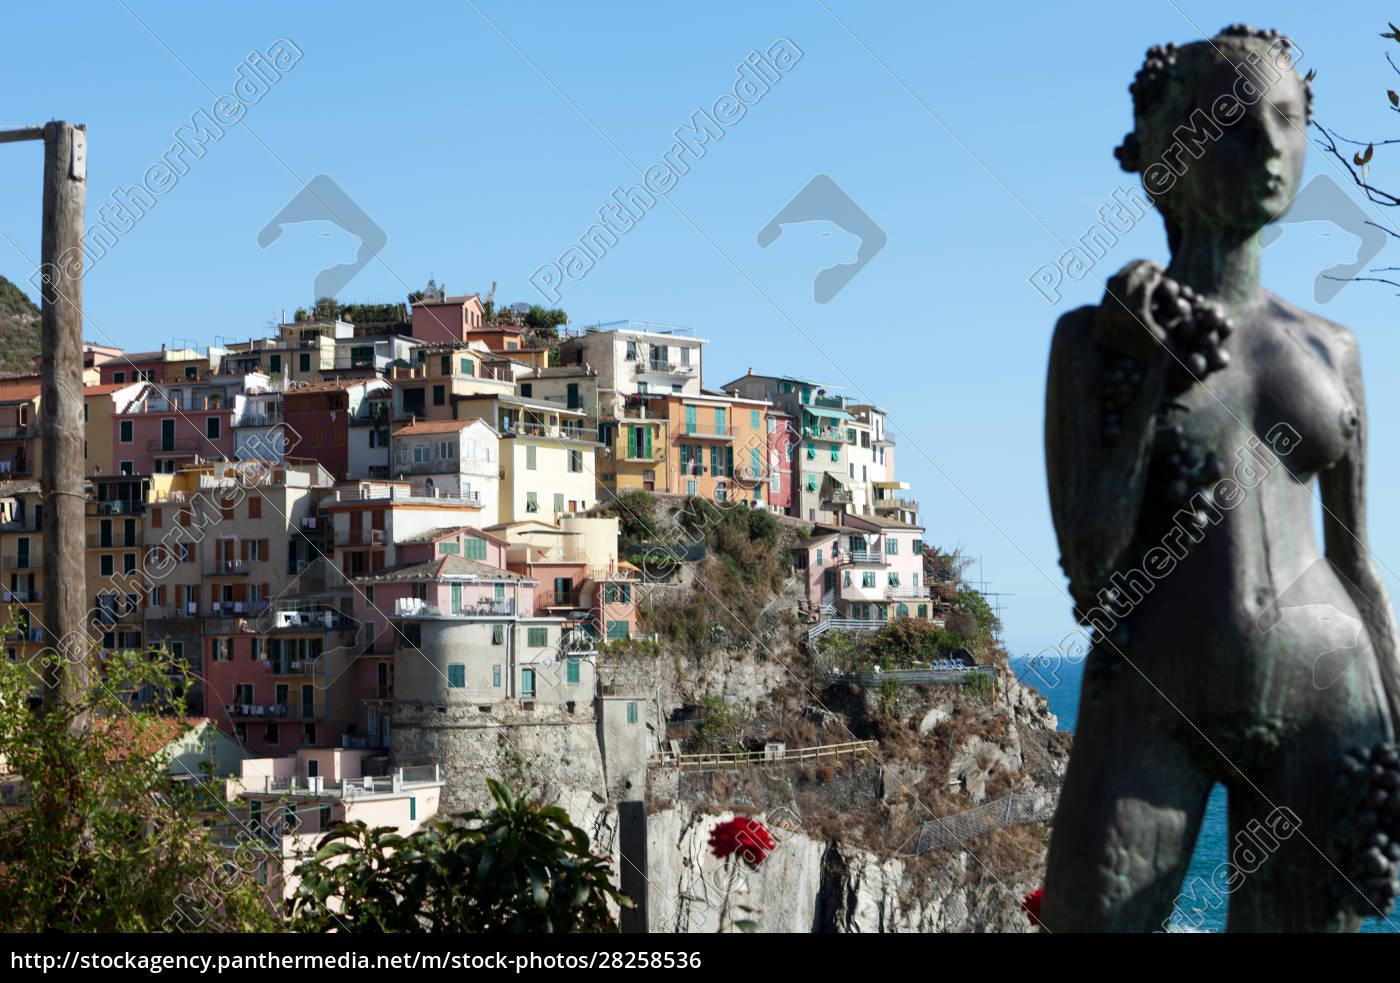 manarola, -, one, of, the, cities - 28258536